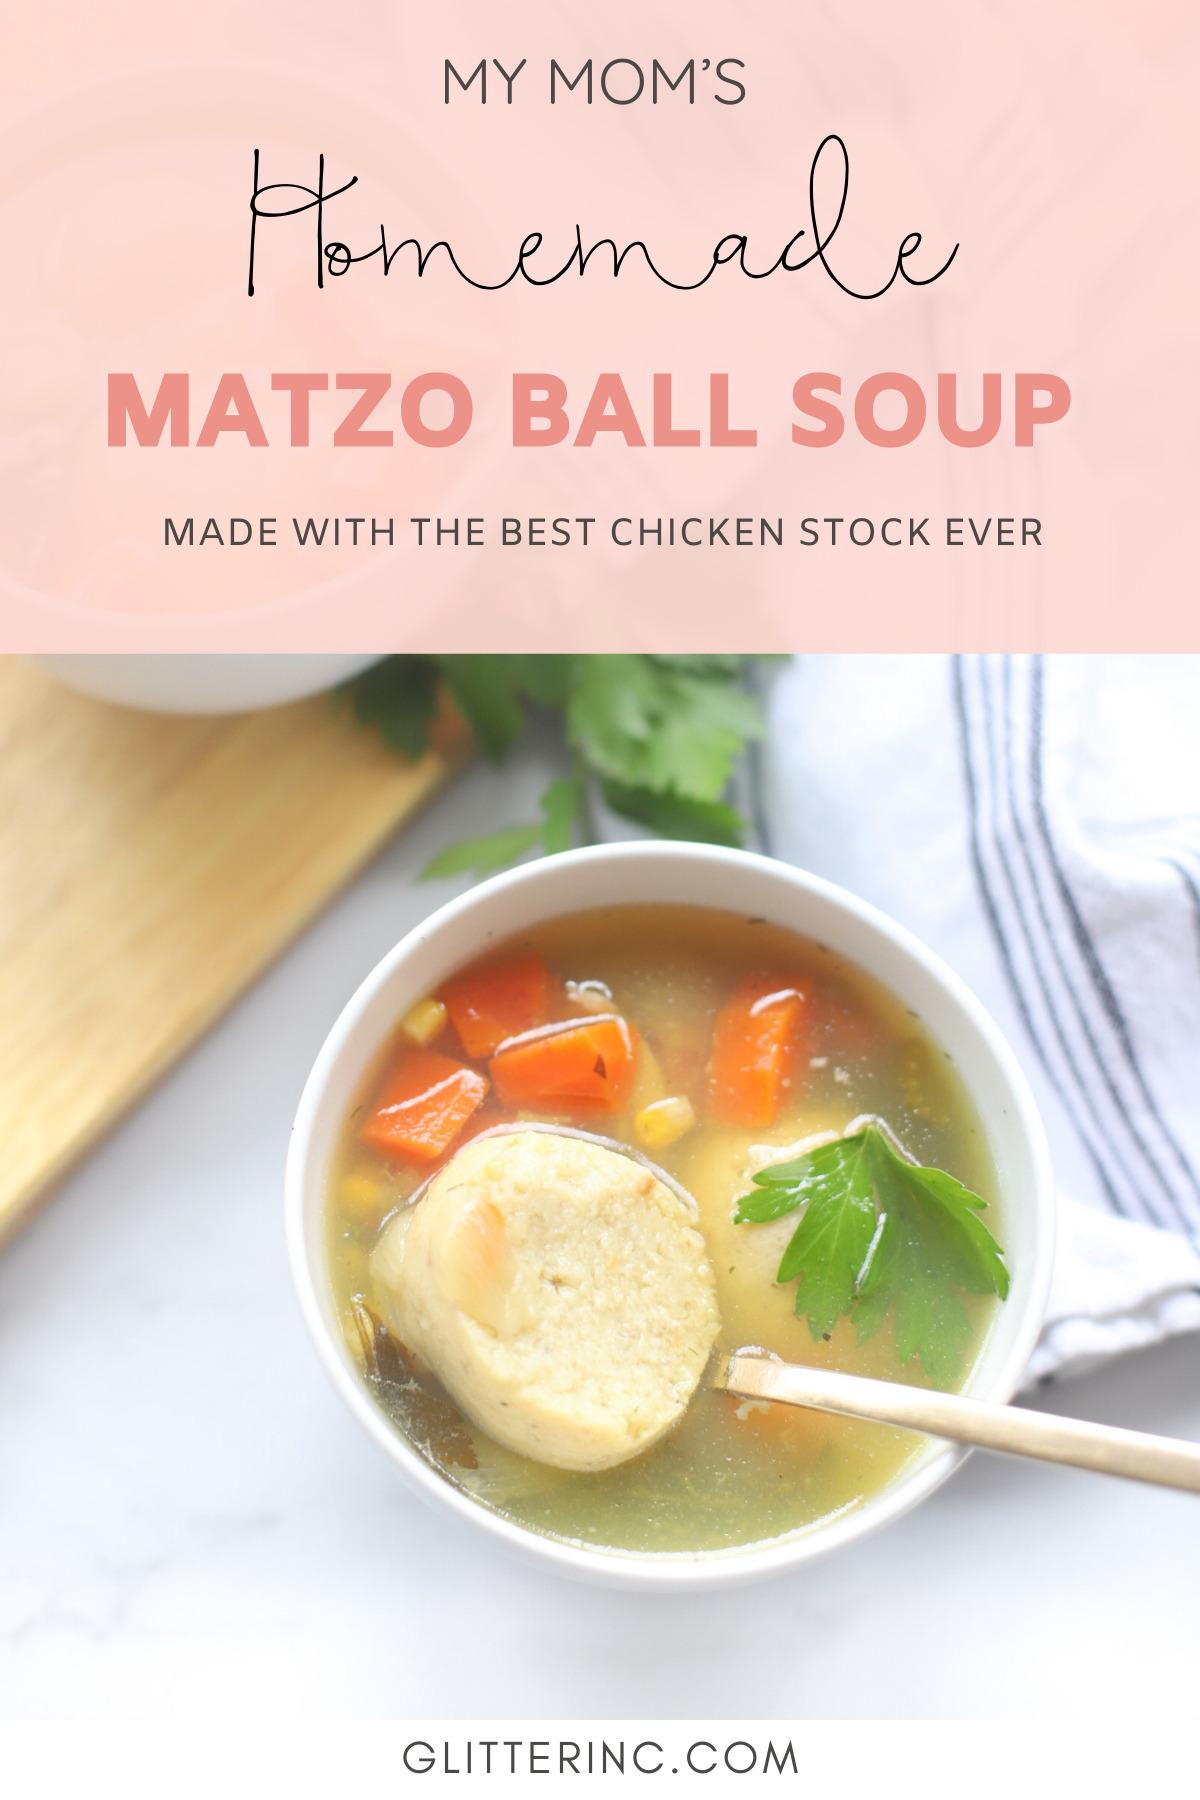 Homemade Matzo Ball Soup - Our Family Favorite Classic Jewish Chicken Stock with the Best Matzoh Balls | @glitterinclexi | GLITTERINC.COM